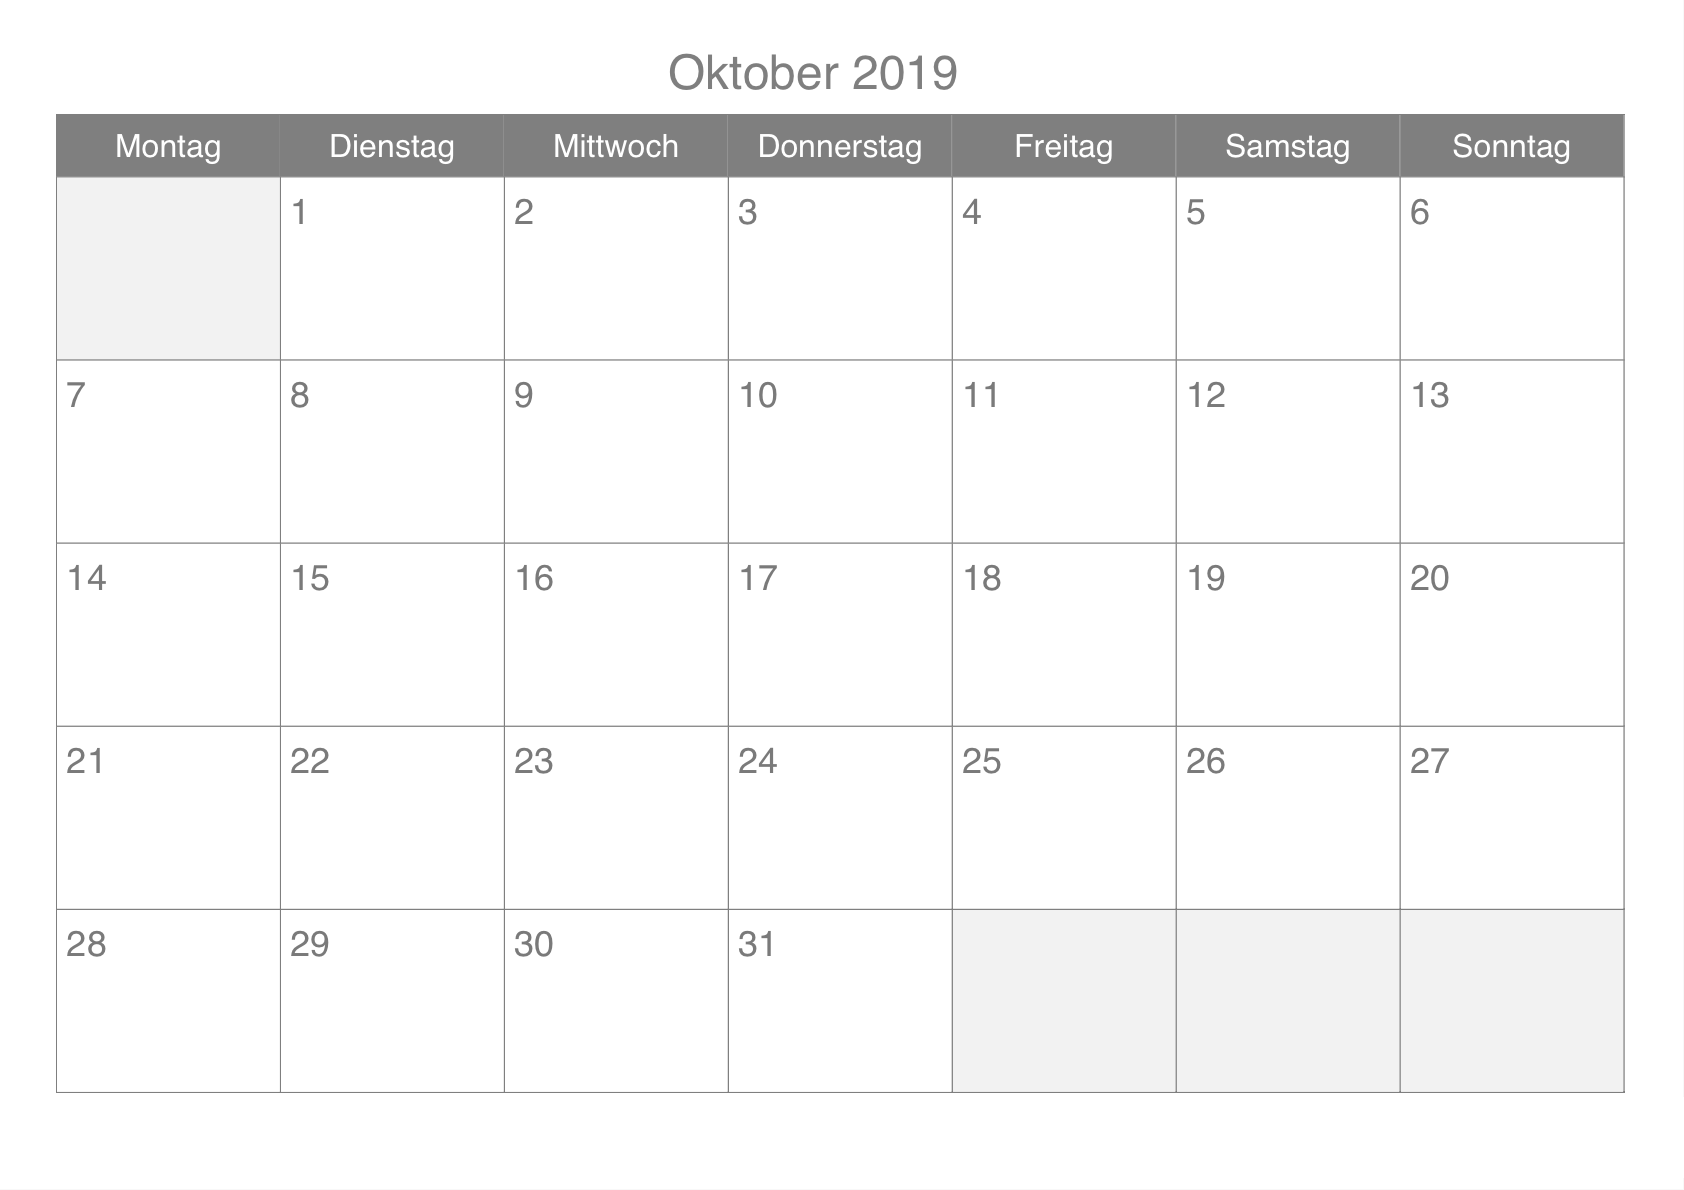 Oktober 2019 Kalender leer